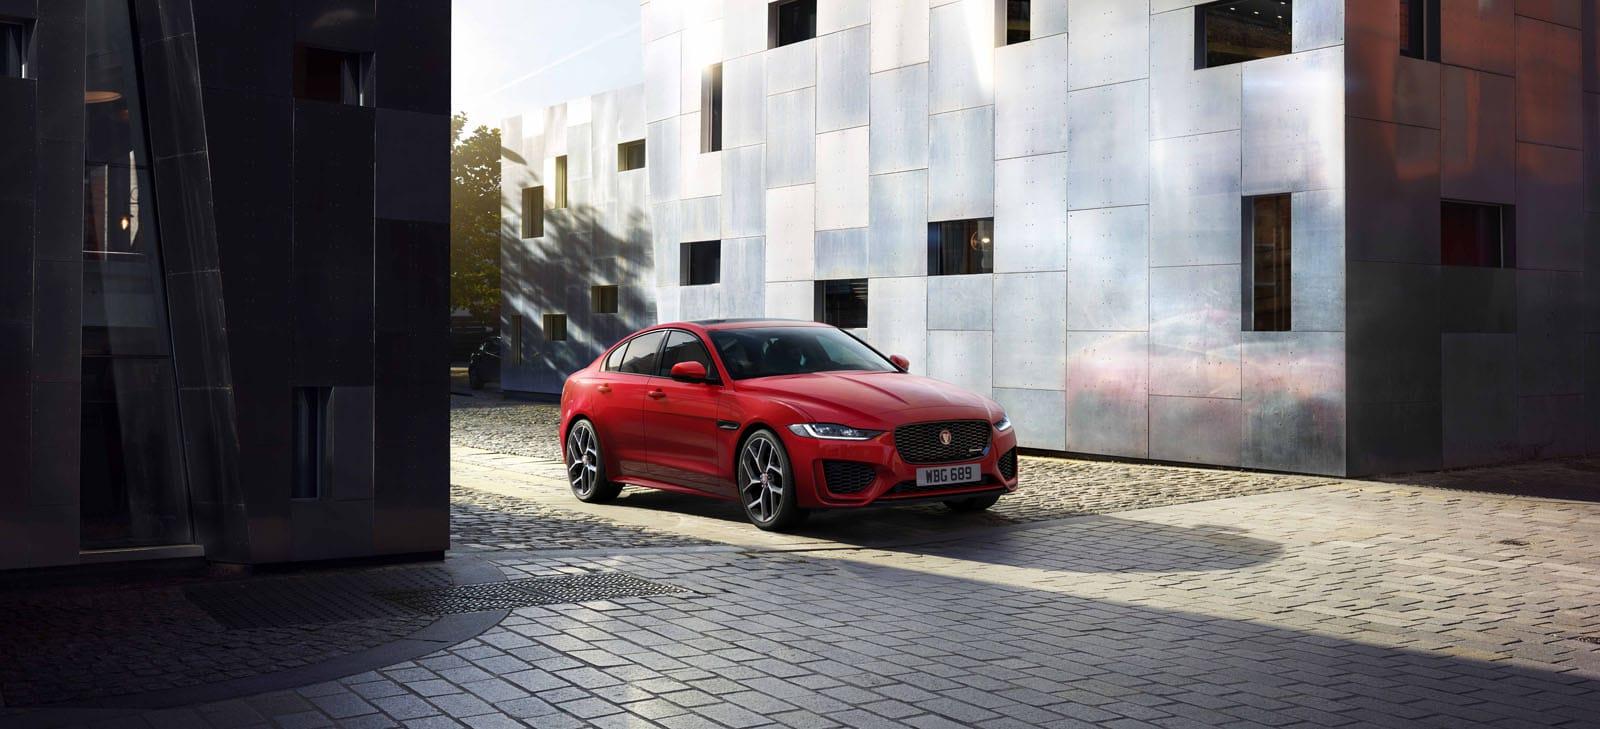 Jaguar new models may be on the way